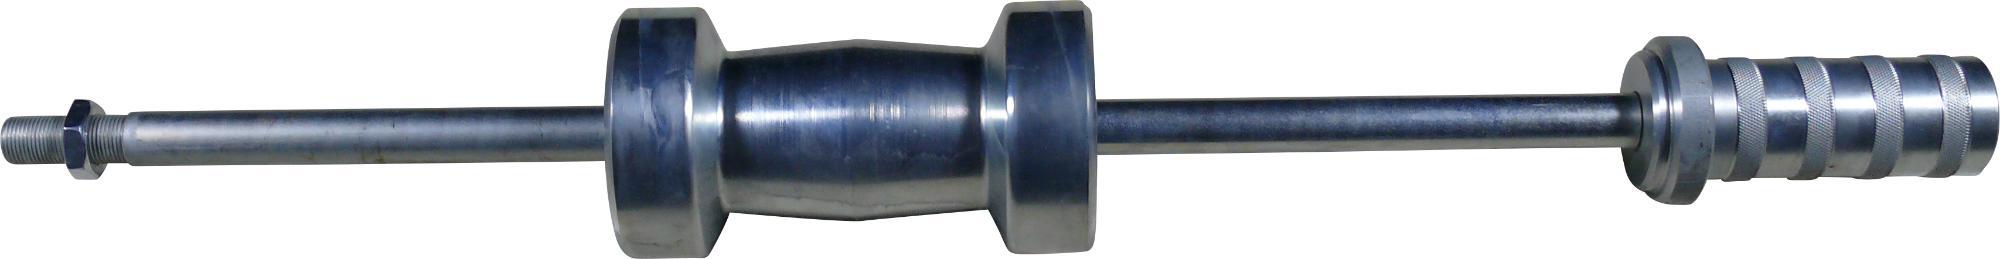 Kladivo, 5 kg, M18x1.5, 710 mm